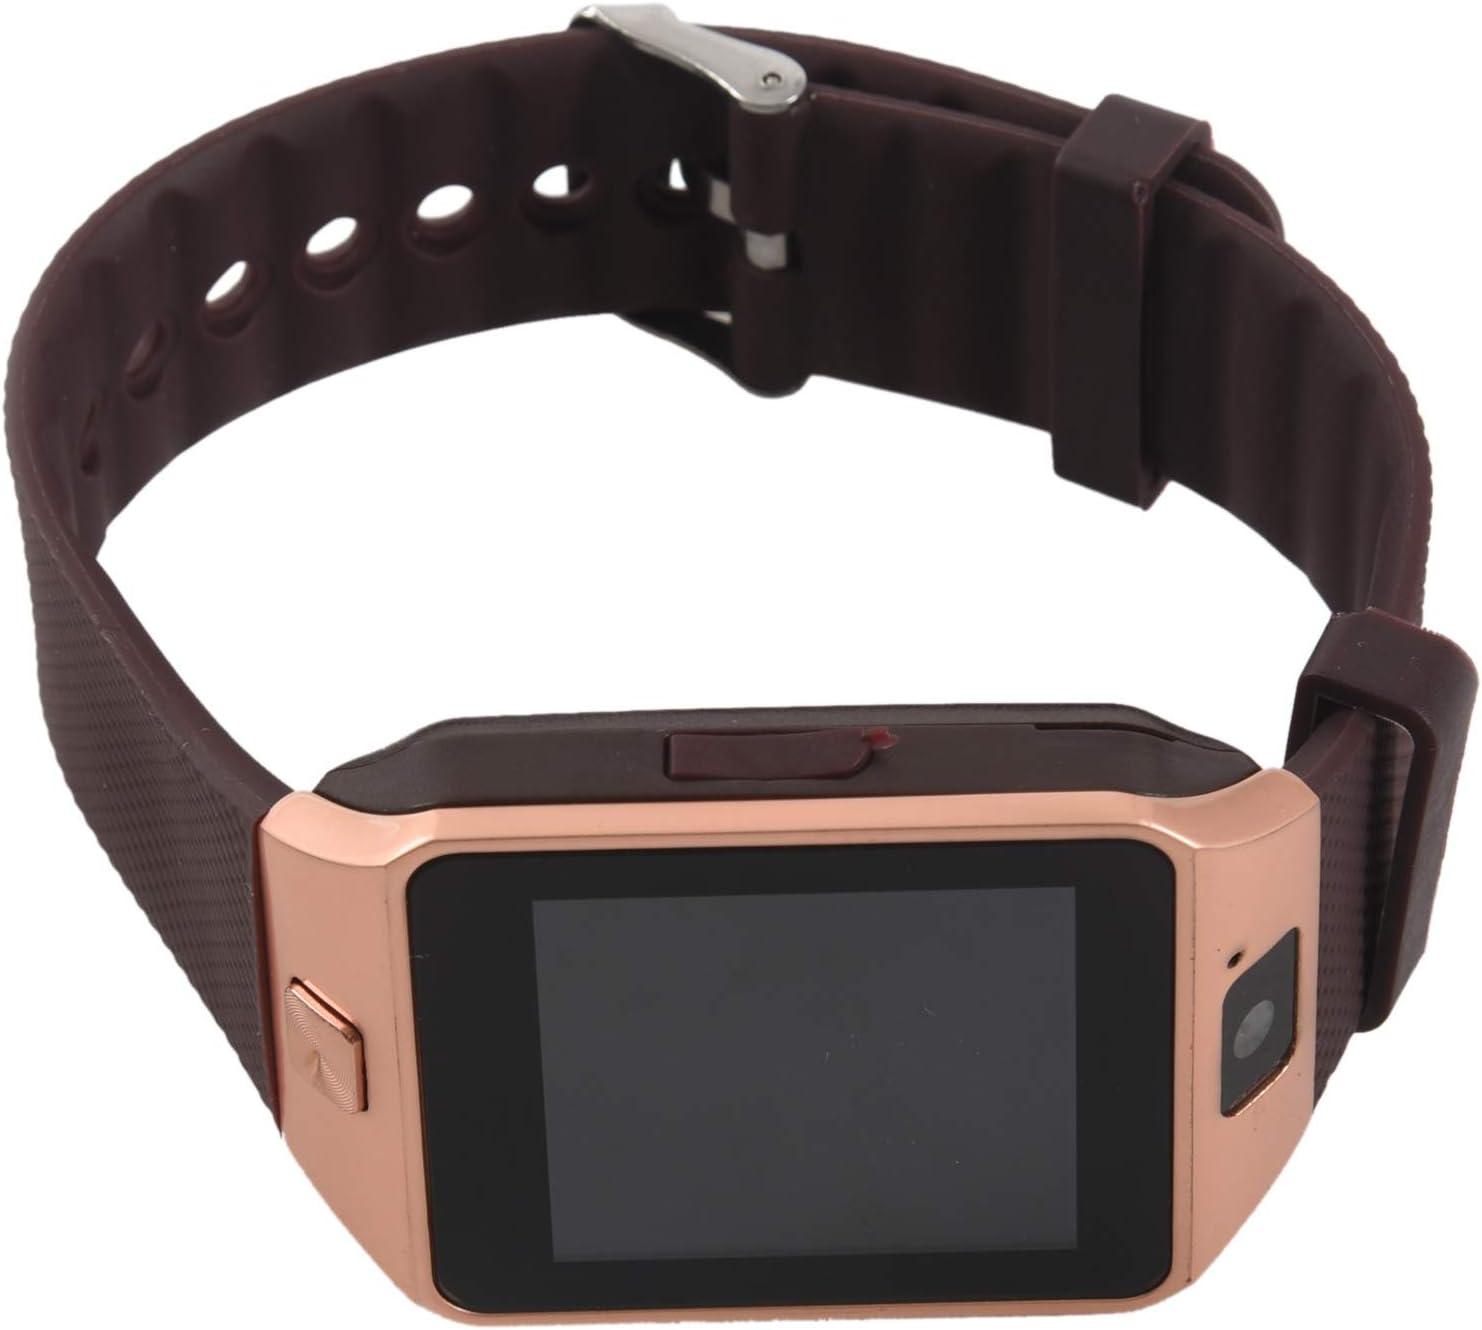 reloj de telefono elegante - TOOGOO(R) DZ09 Reloj de telefono inteligente de Bluetooth para telefono inteligente de Samsung iphone HTC Android con camara de telefono SIM oro